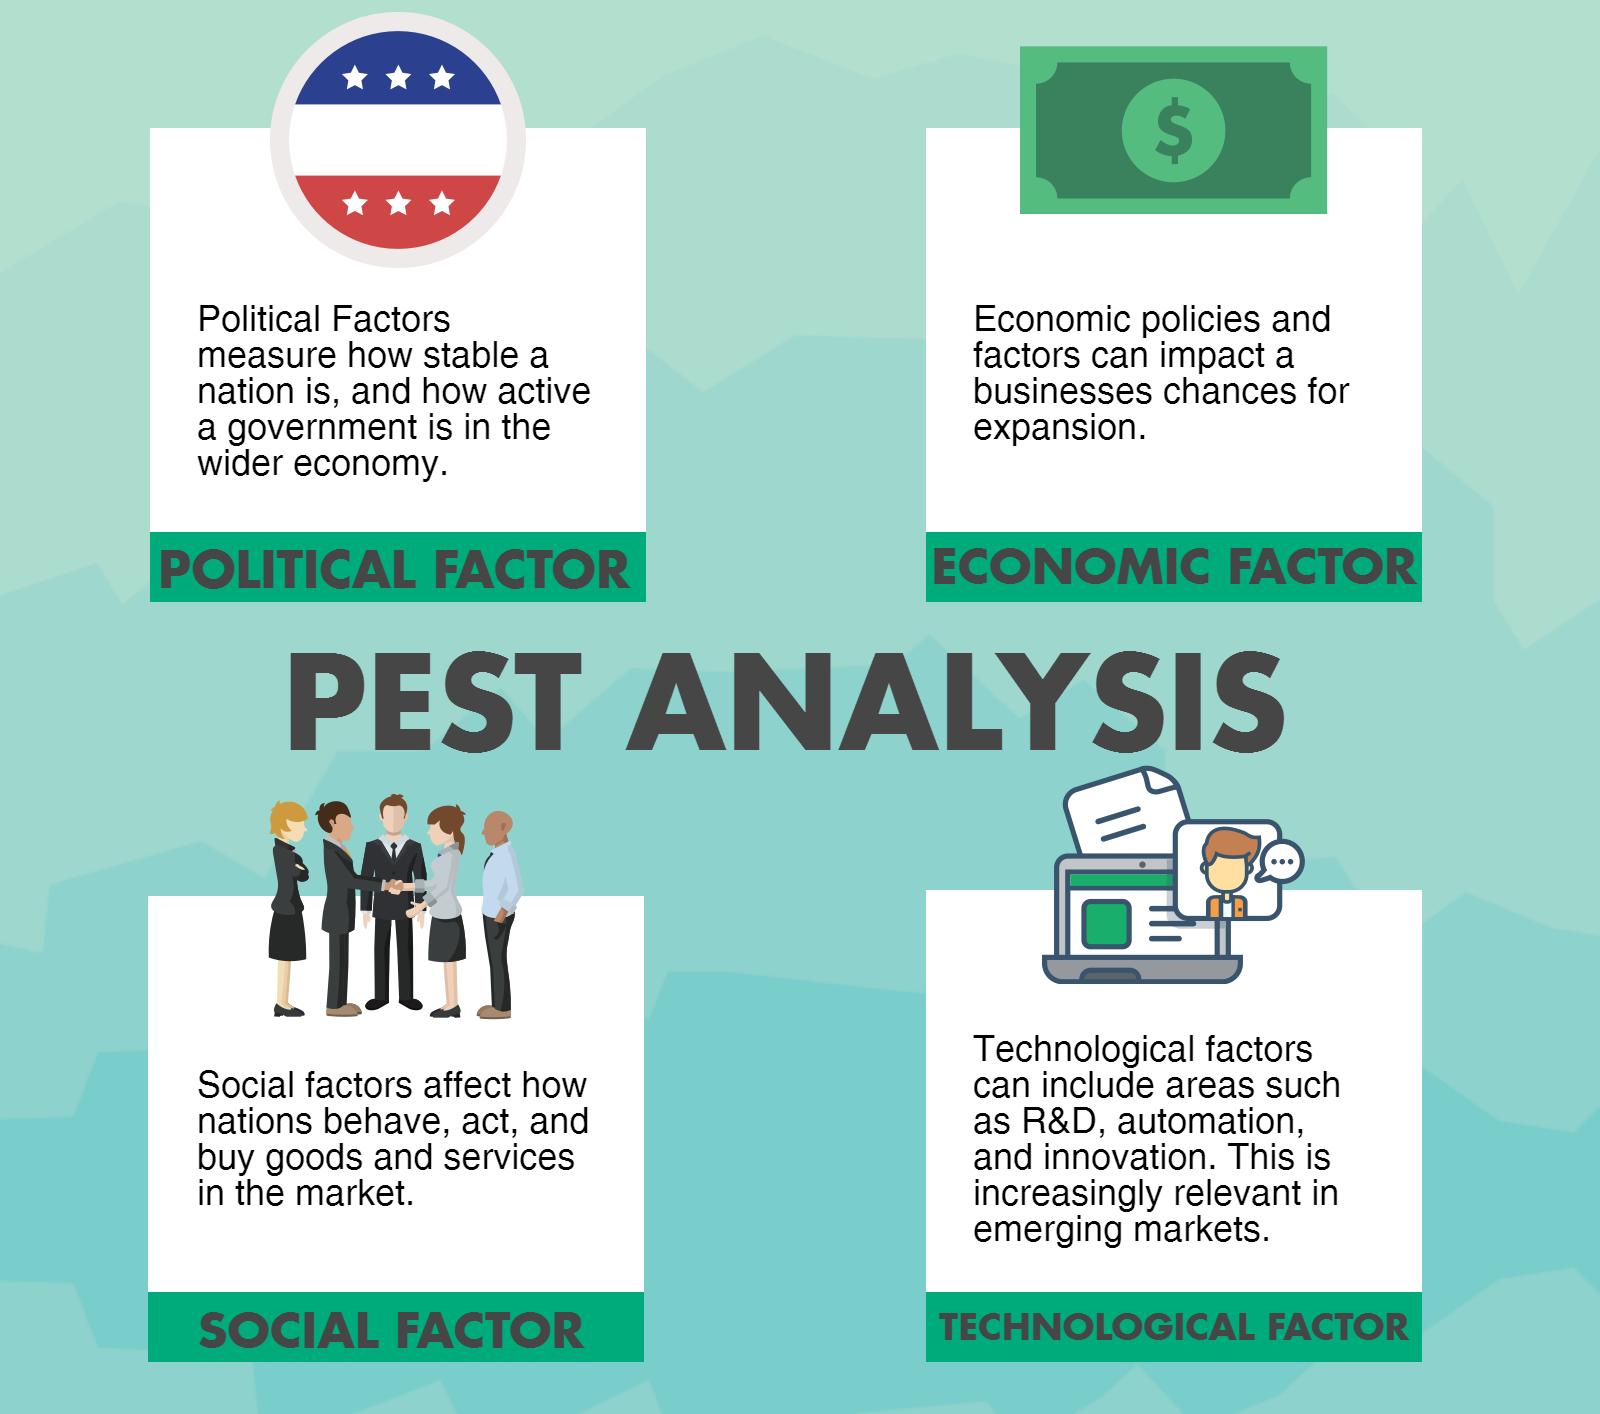 pest analysis logistics company Solutions v: logistics pest analysis - προκλήσεις και λύσεις στο νέο θεσμικό και οικονομικό περιβάλλον.